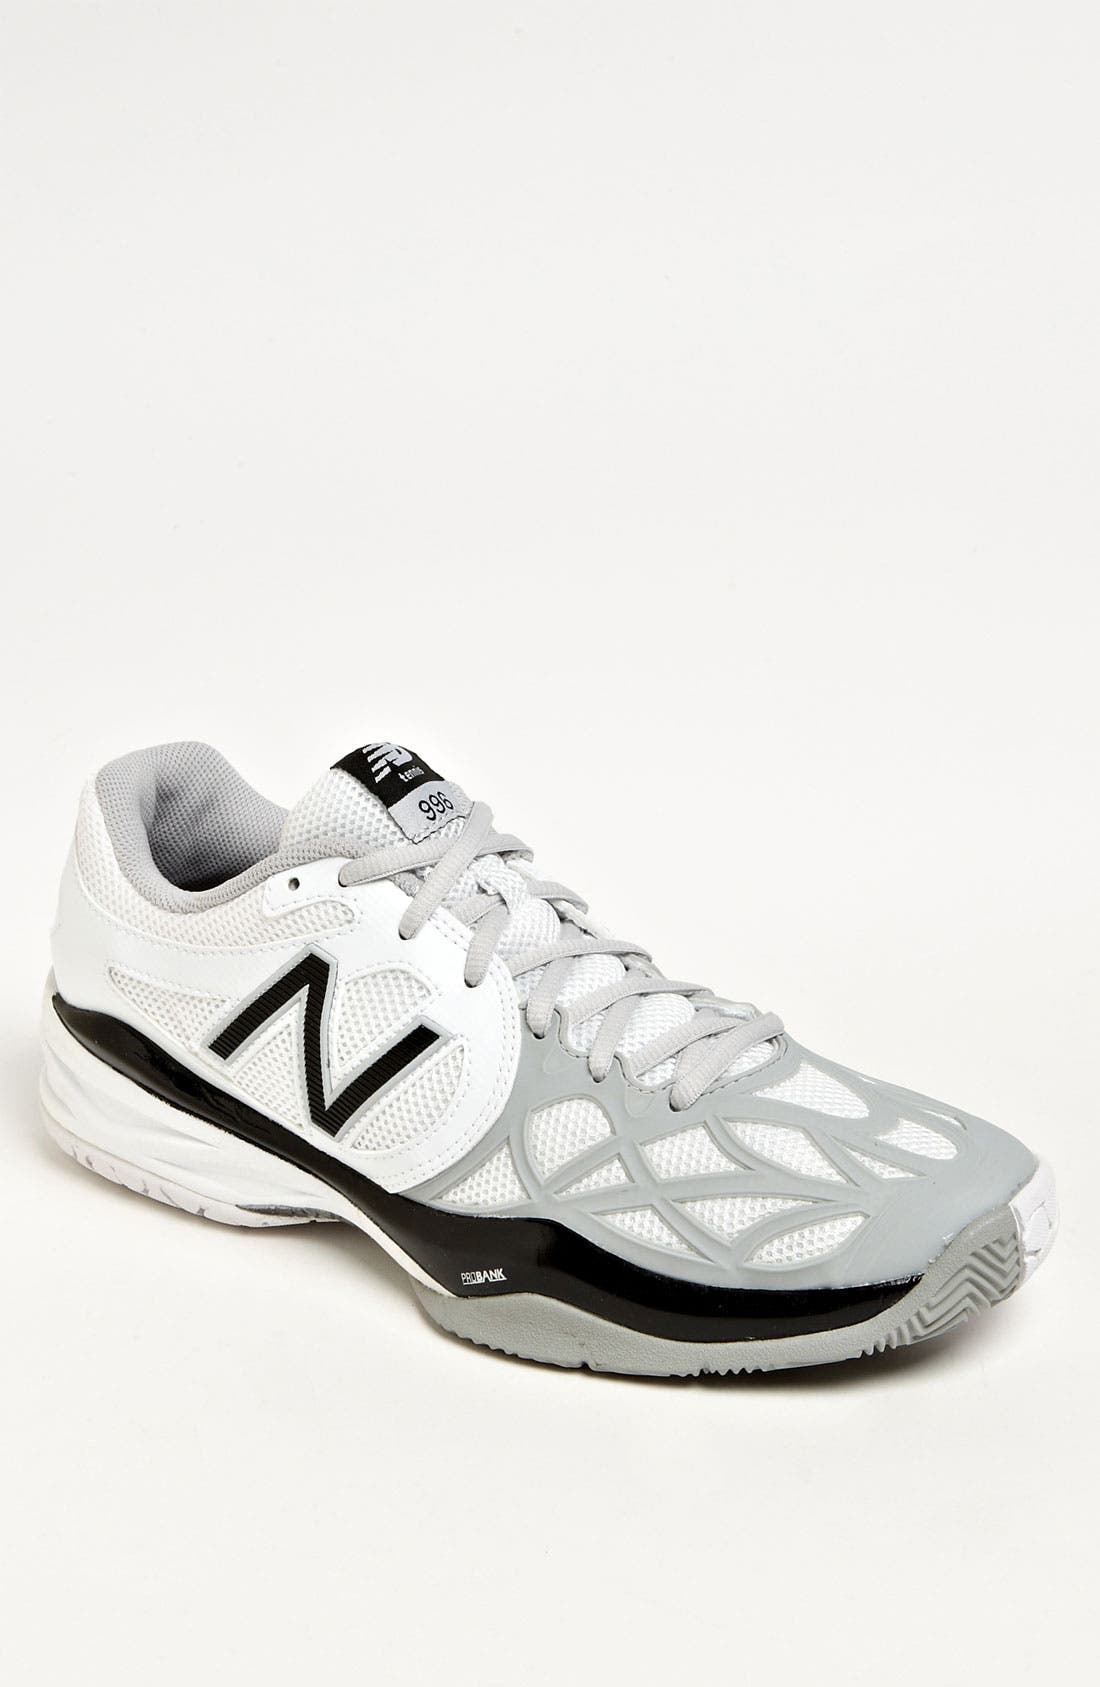 Main Image - New Balance '996' Tennis Shoe (Men)